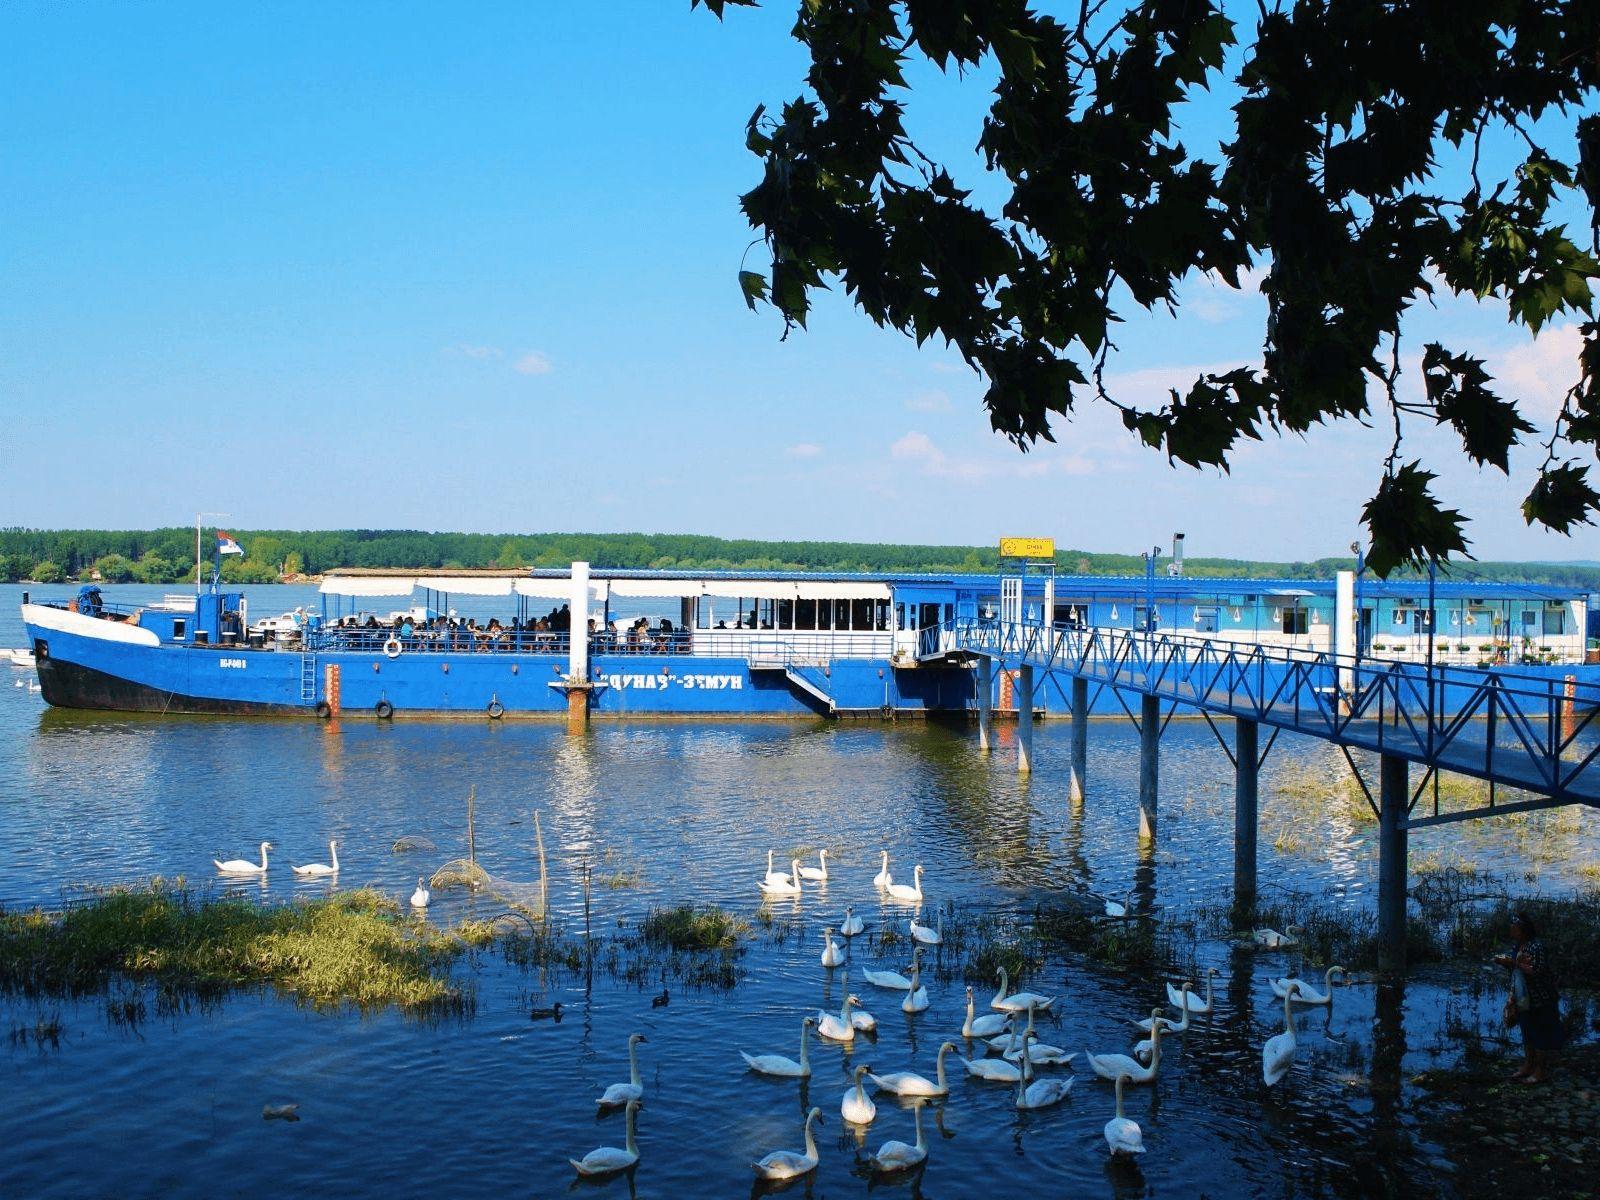 BALKAN TURA - First Minute!: Beograd: krstarenje Dunavom i Savom